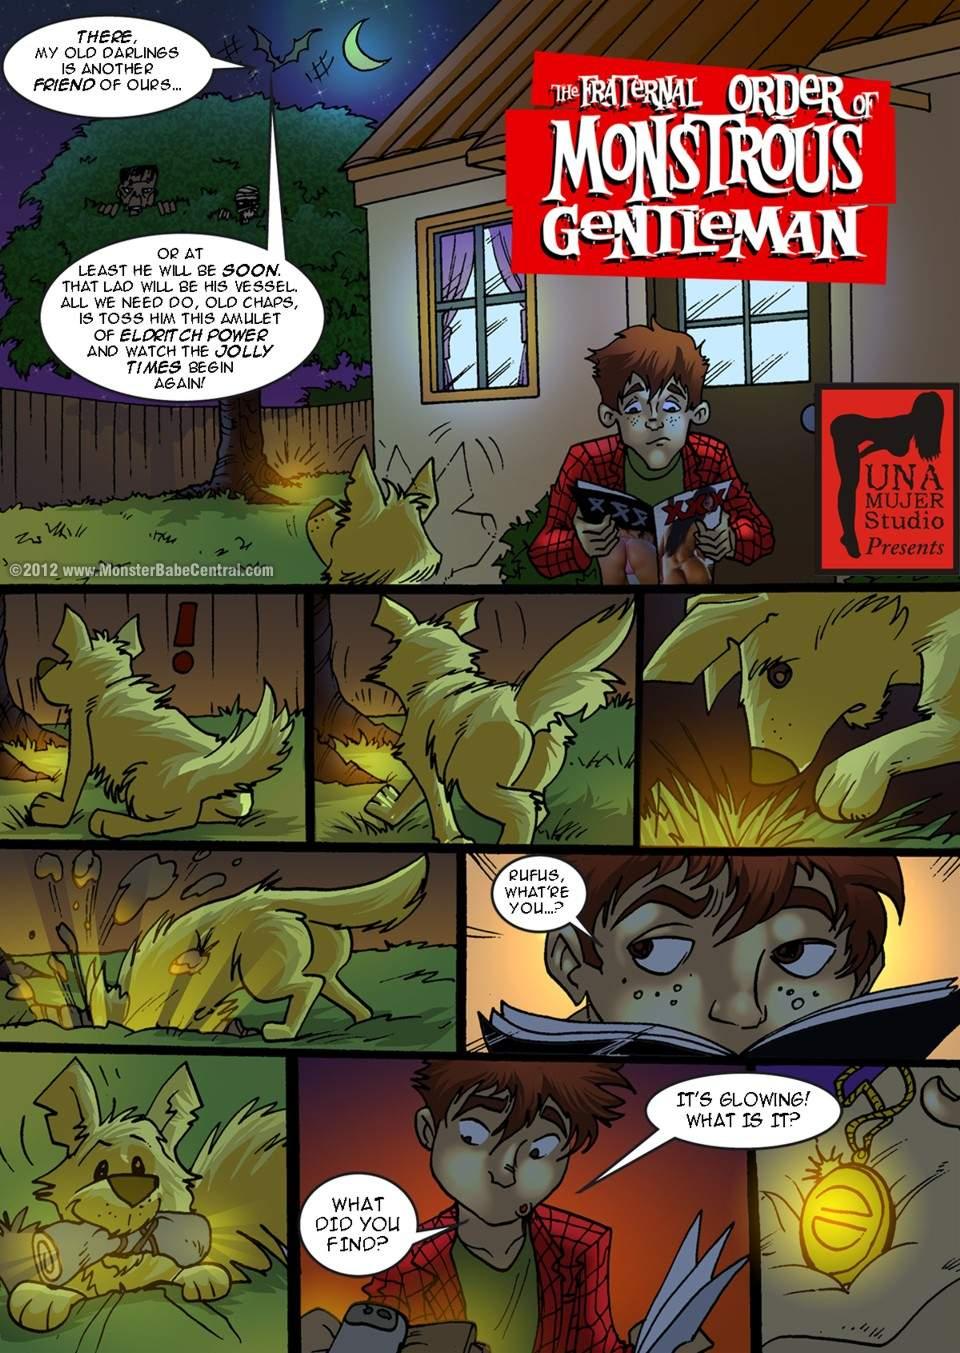 SureFap xxx porno Crossover - [MonsterBabeCentral] - The Fraternal Order of Monstrous Gentlemen! - Issue 3 - Teen Wolf